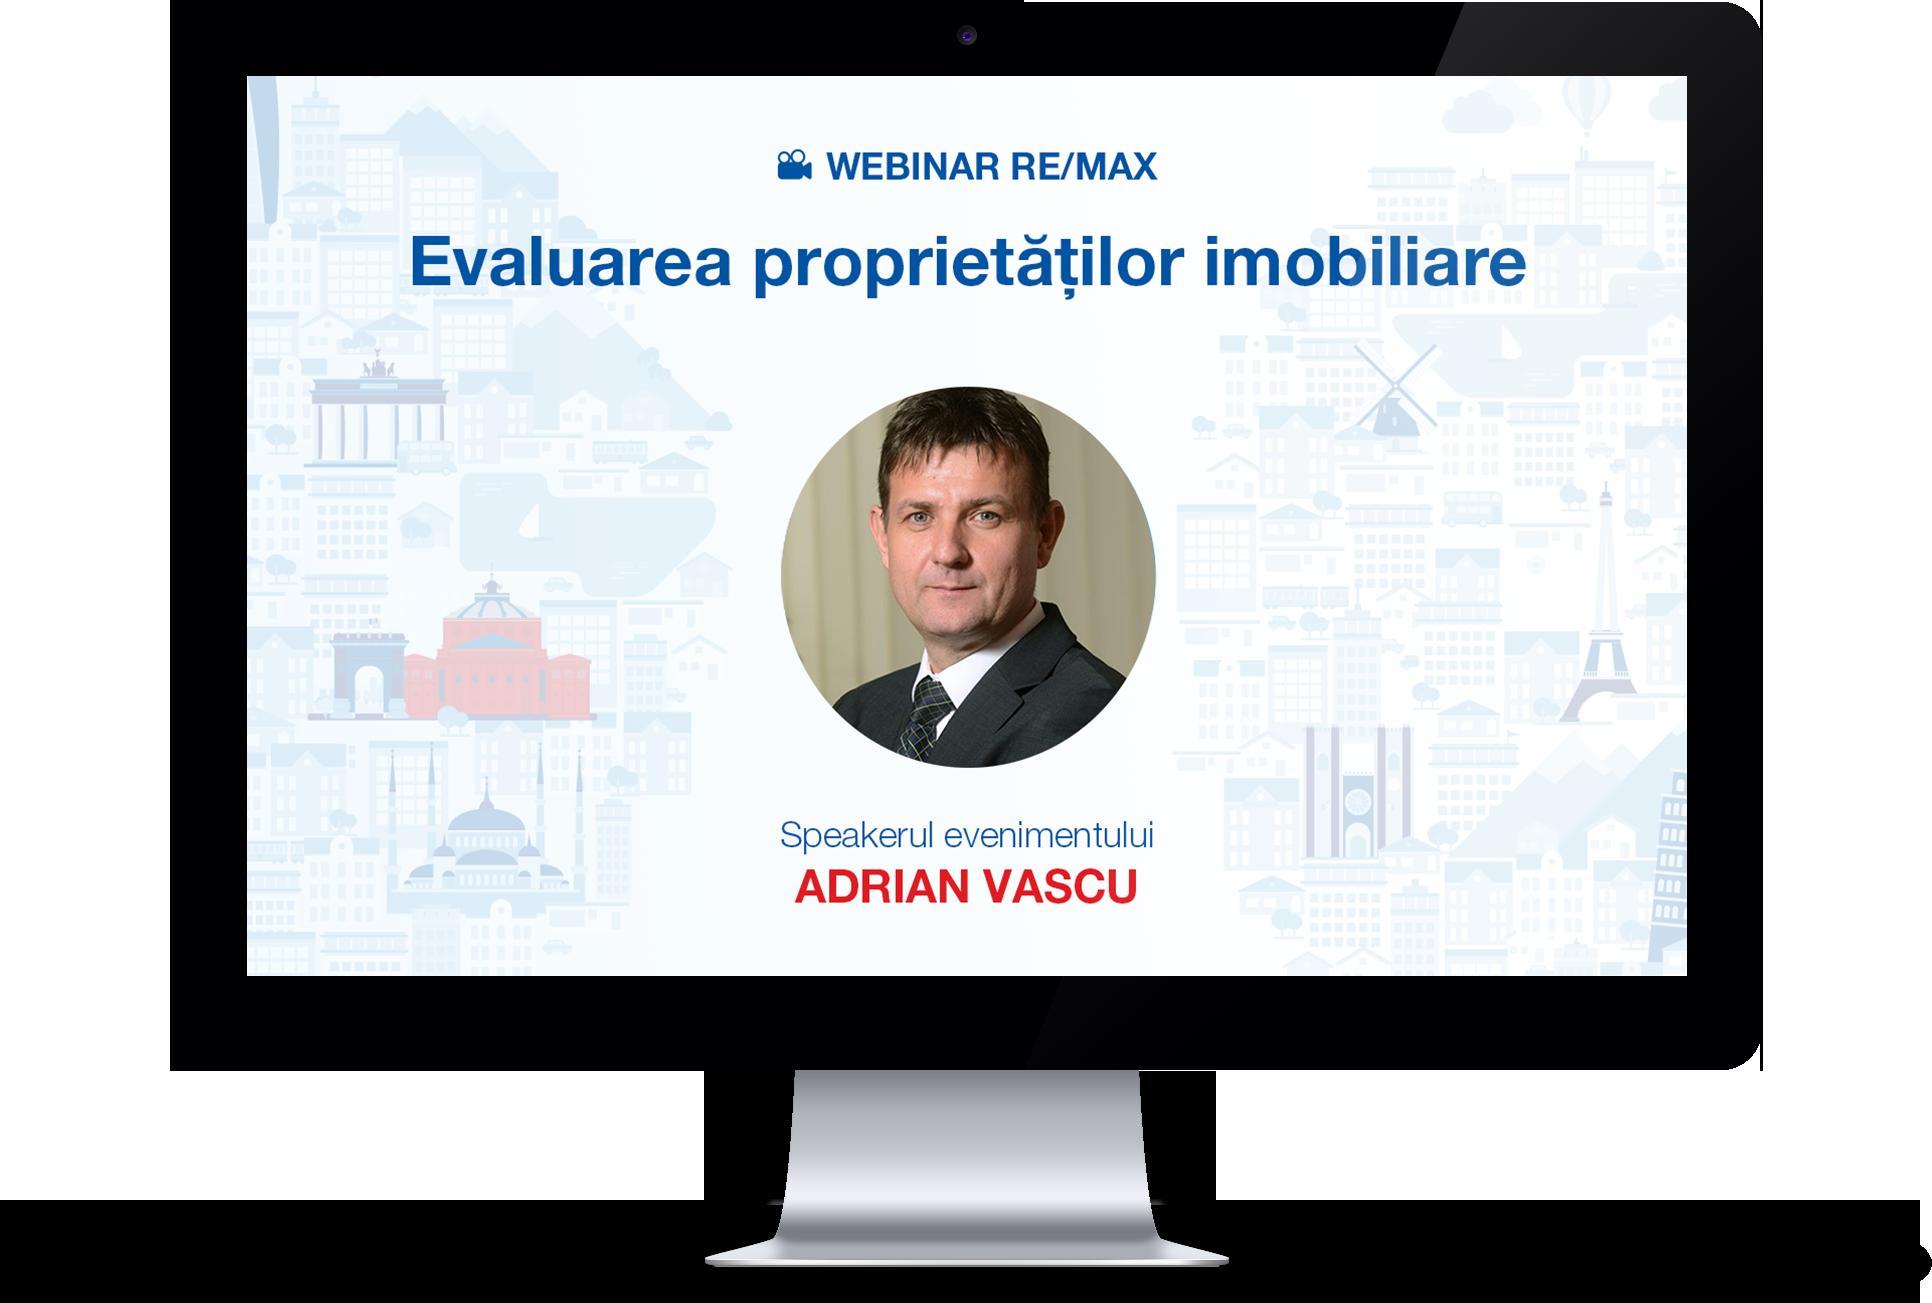 webinar-adrian-vascu-iMac-Mock-up-1.png